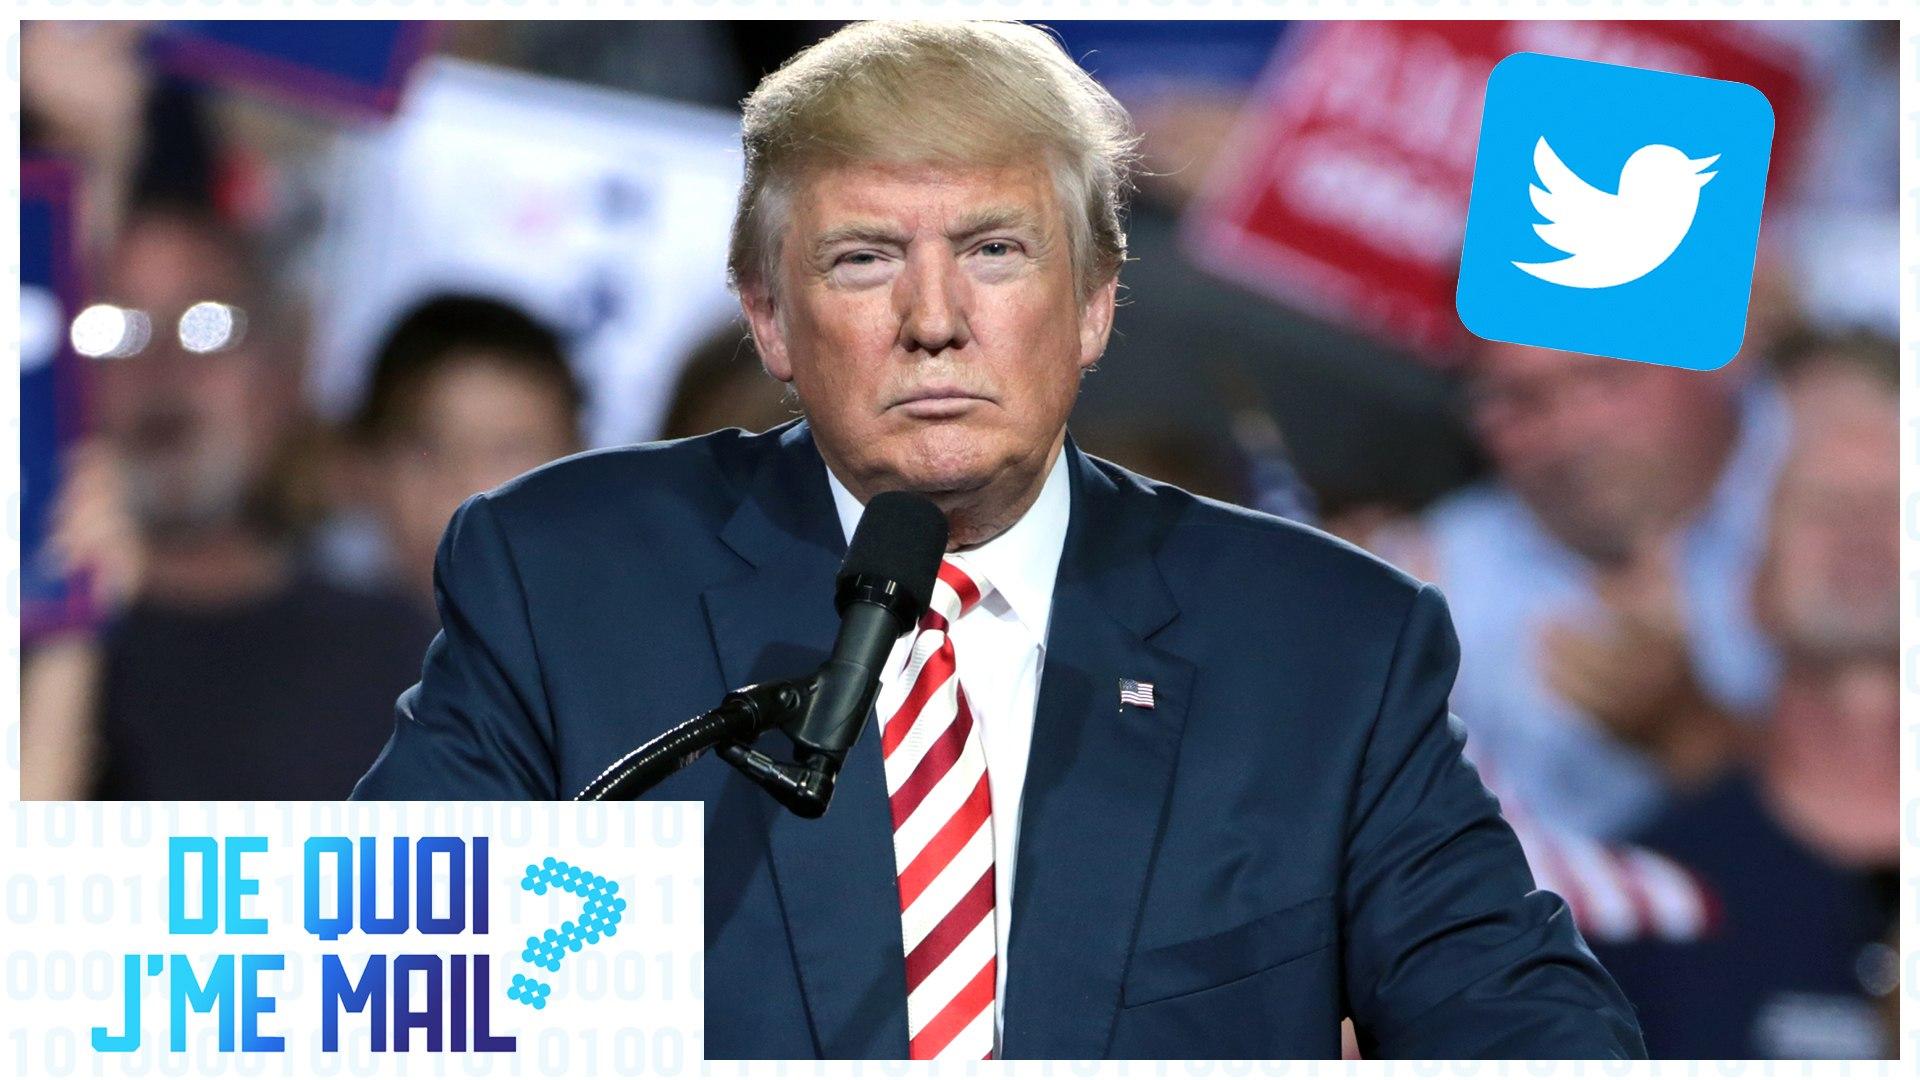 Donald Trump furax contre Twitter DQJMM (1/2)